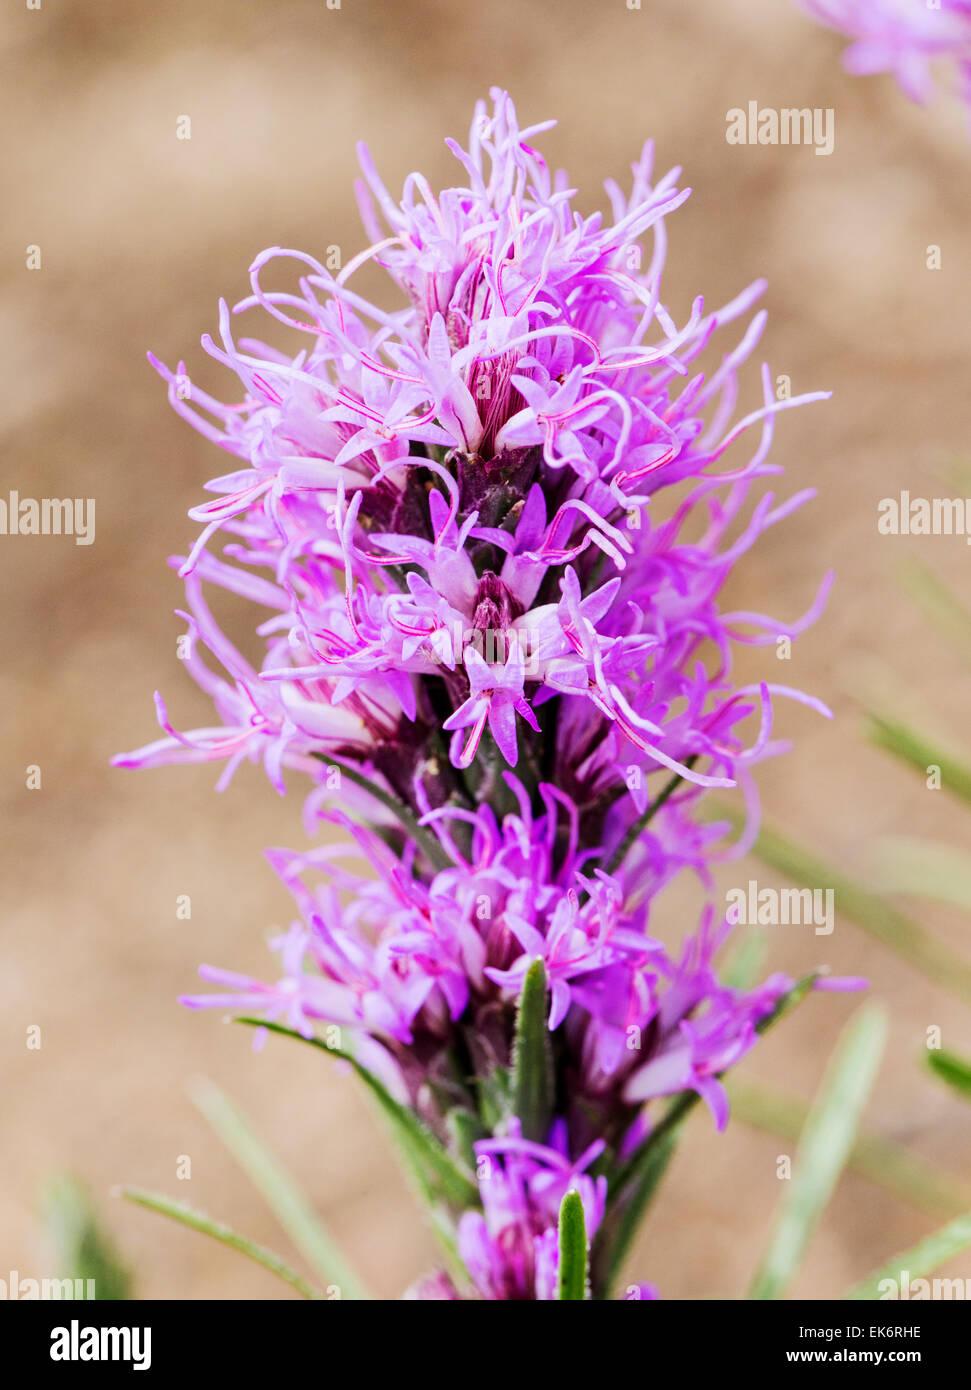 Prairie Blazingstar, Kansas Gayfeather, Liatris pycnostachya, wildflower in bloom, Central Colorado, USA - Stock Image